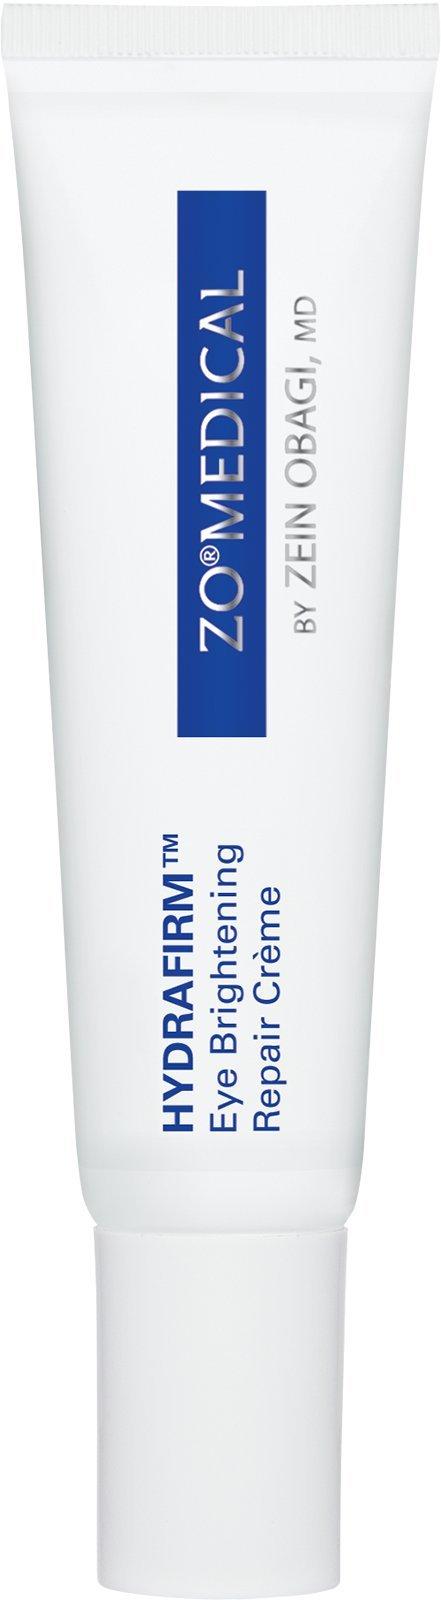 ZO MEDICAL Hydrafirm Eye Brightening Repair Crème - 0.5oz/15g